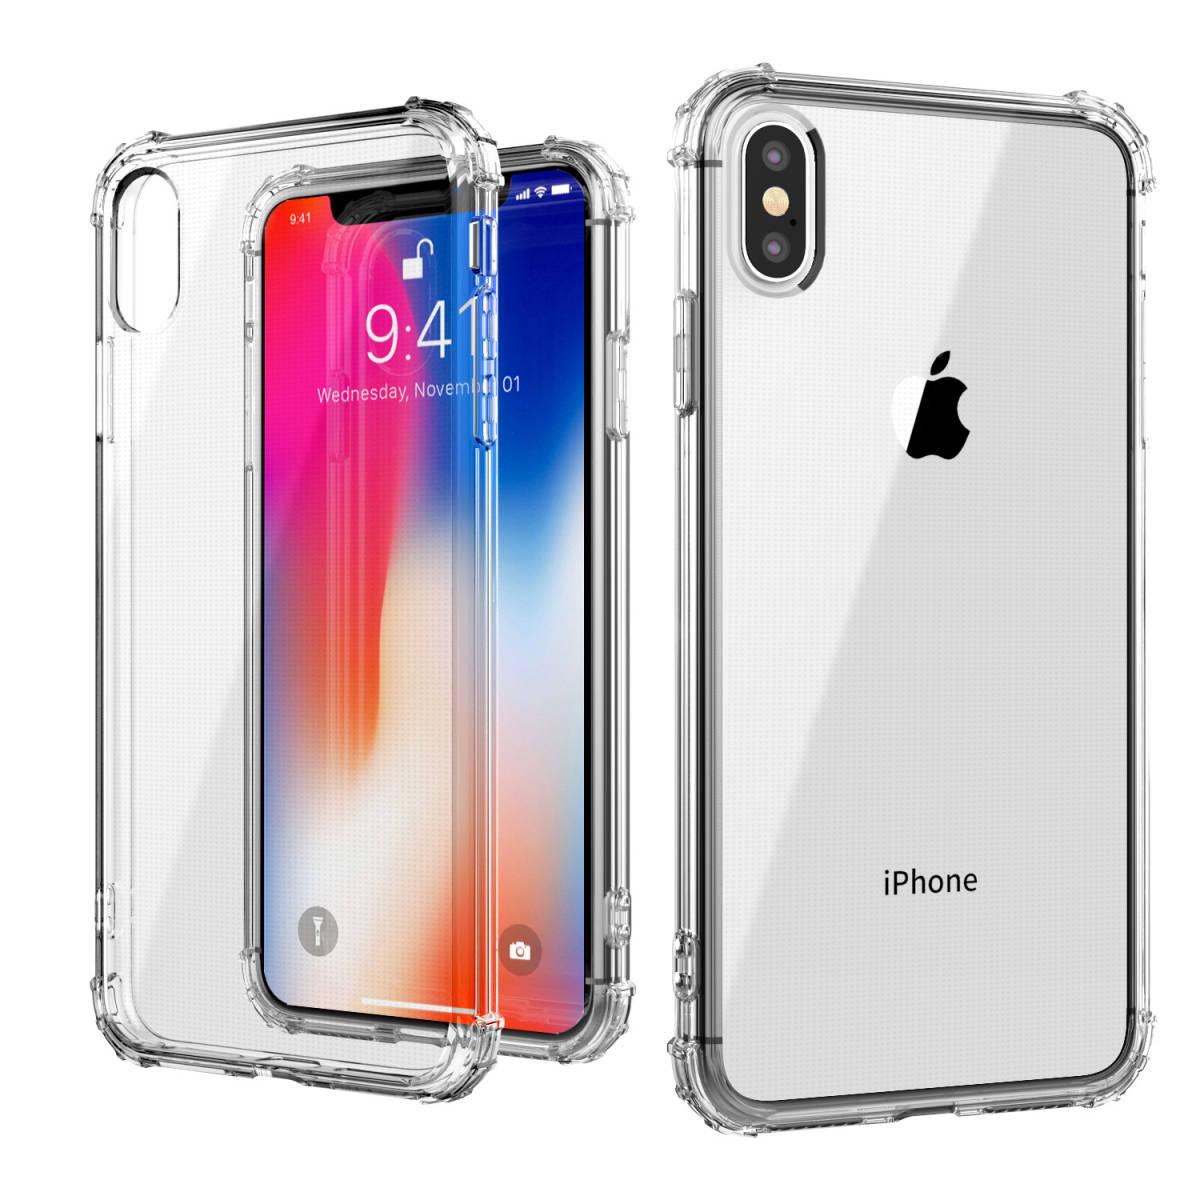 iPhone XS Max TPUケース透明ソフトクリアケース TPU 耐衝撃 衝撃吸収 ストラップホール付き 全面保護カバー 傷つけ防止_画像1